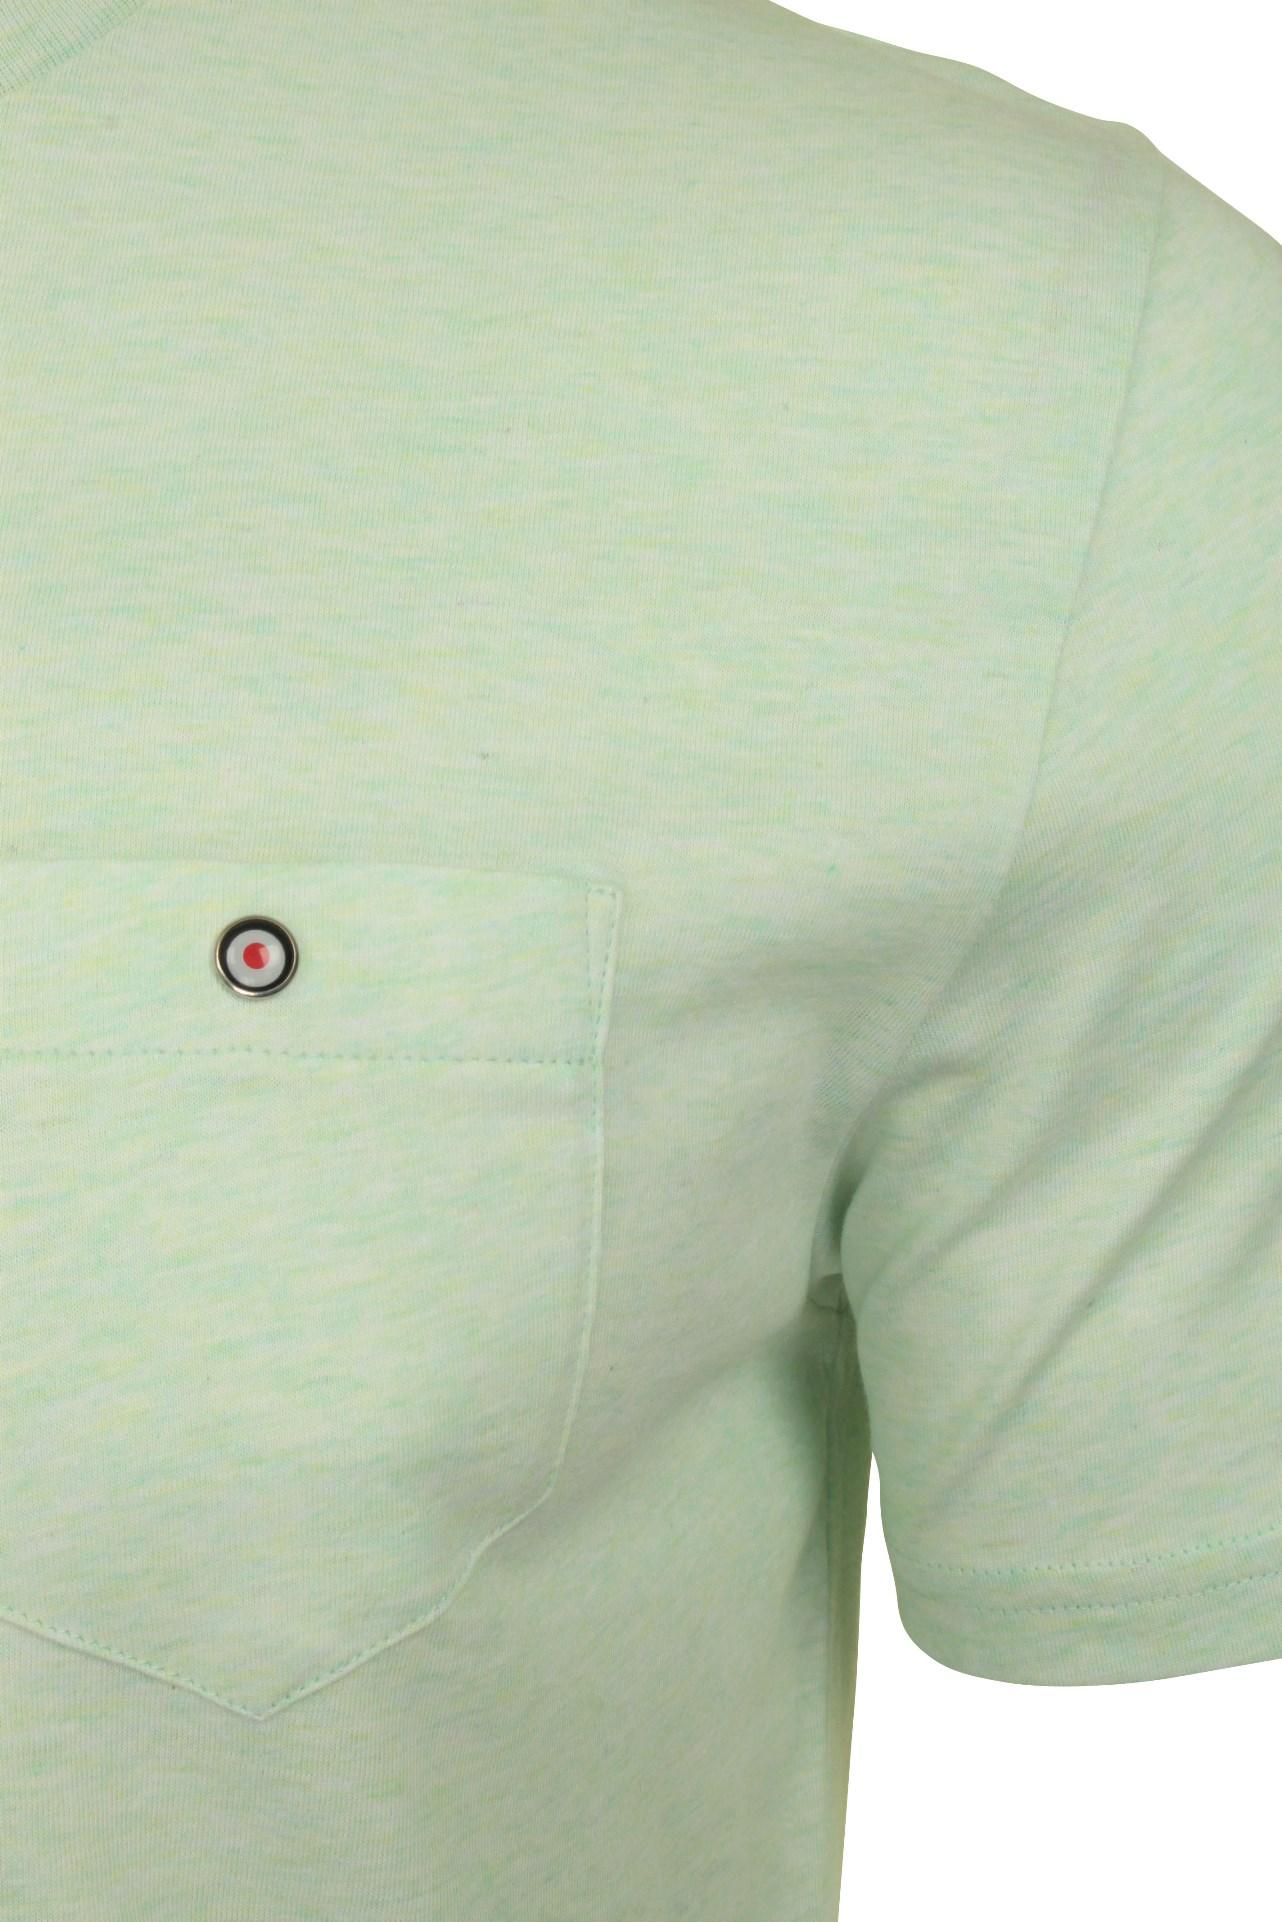 Mens-Classic-Spade-Pocket-T-Shirt-by-Ben-Sherman thumbnail 21